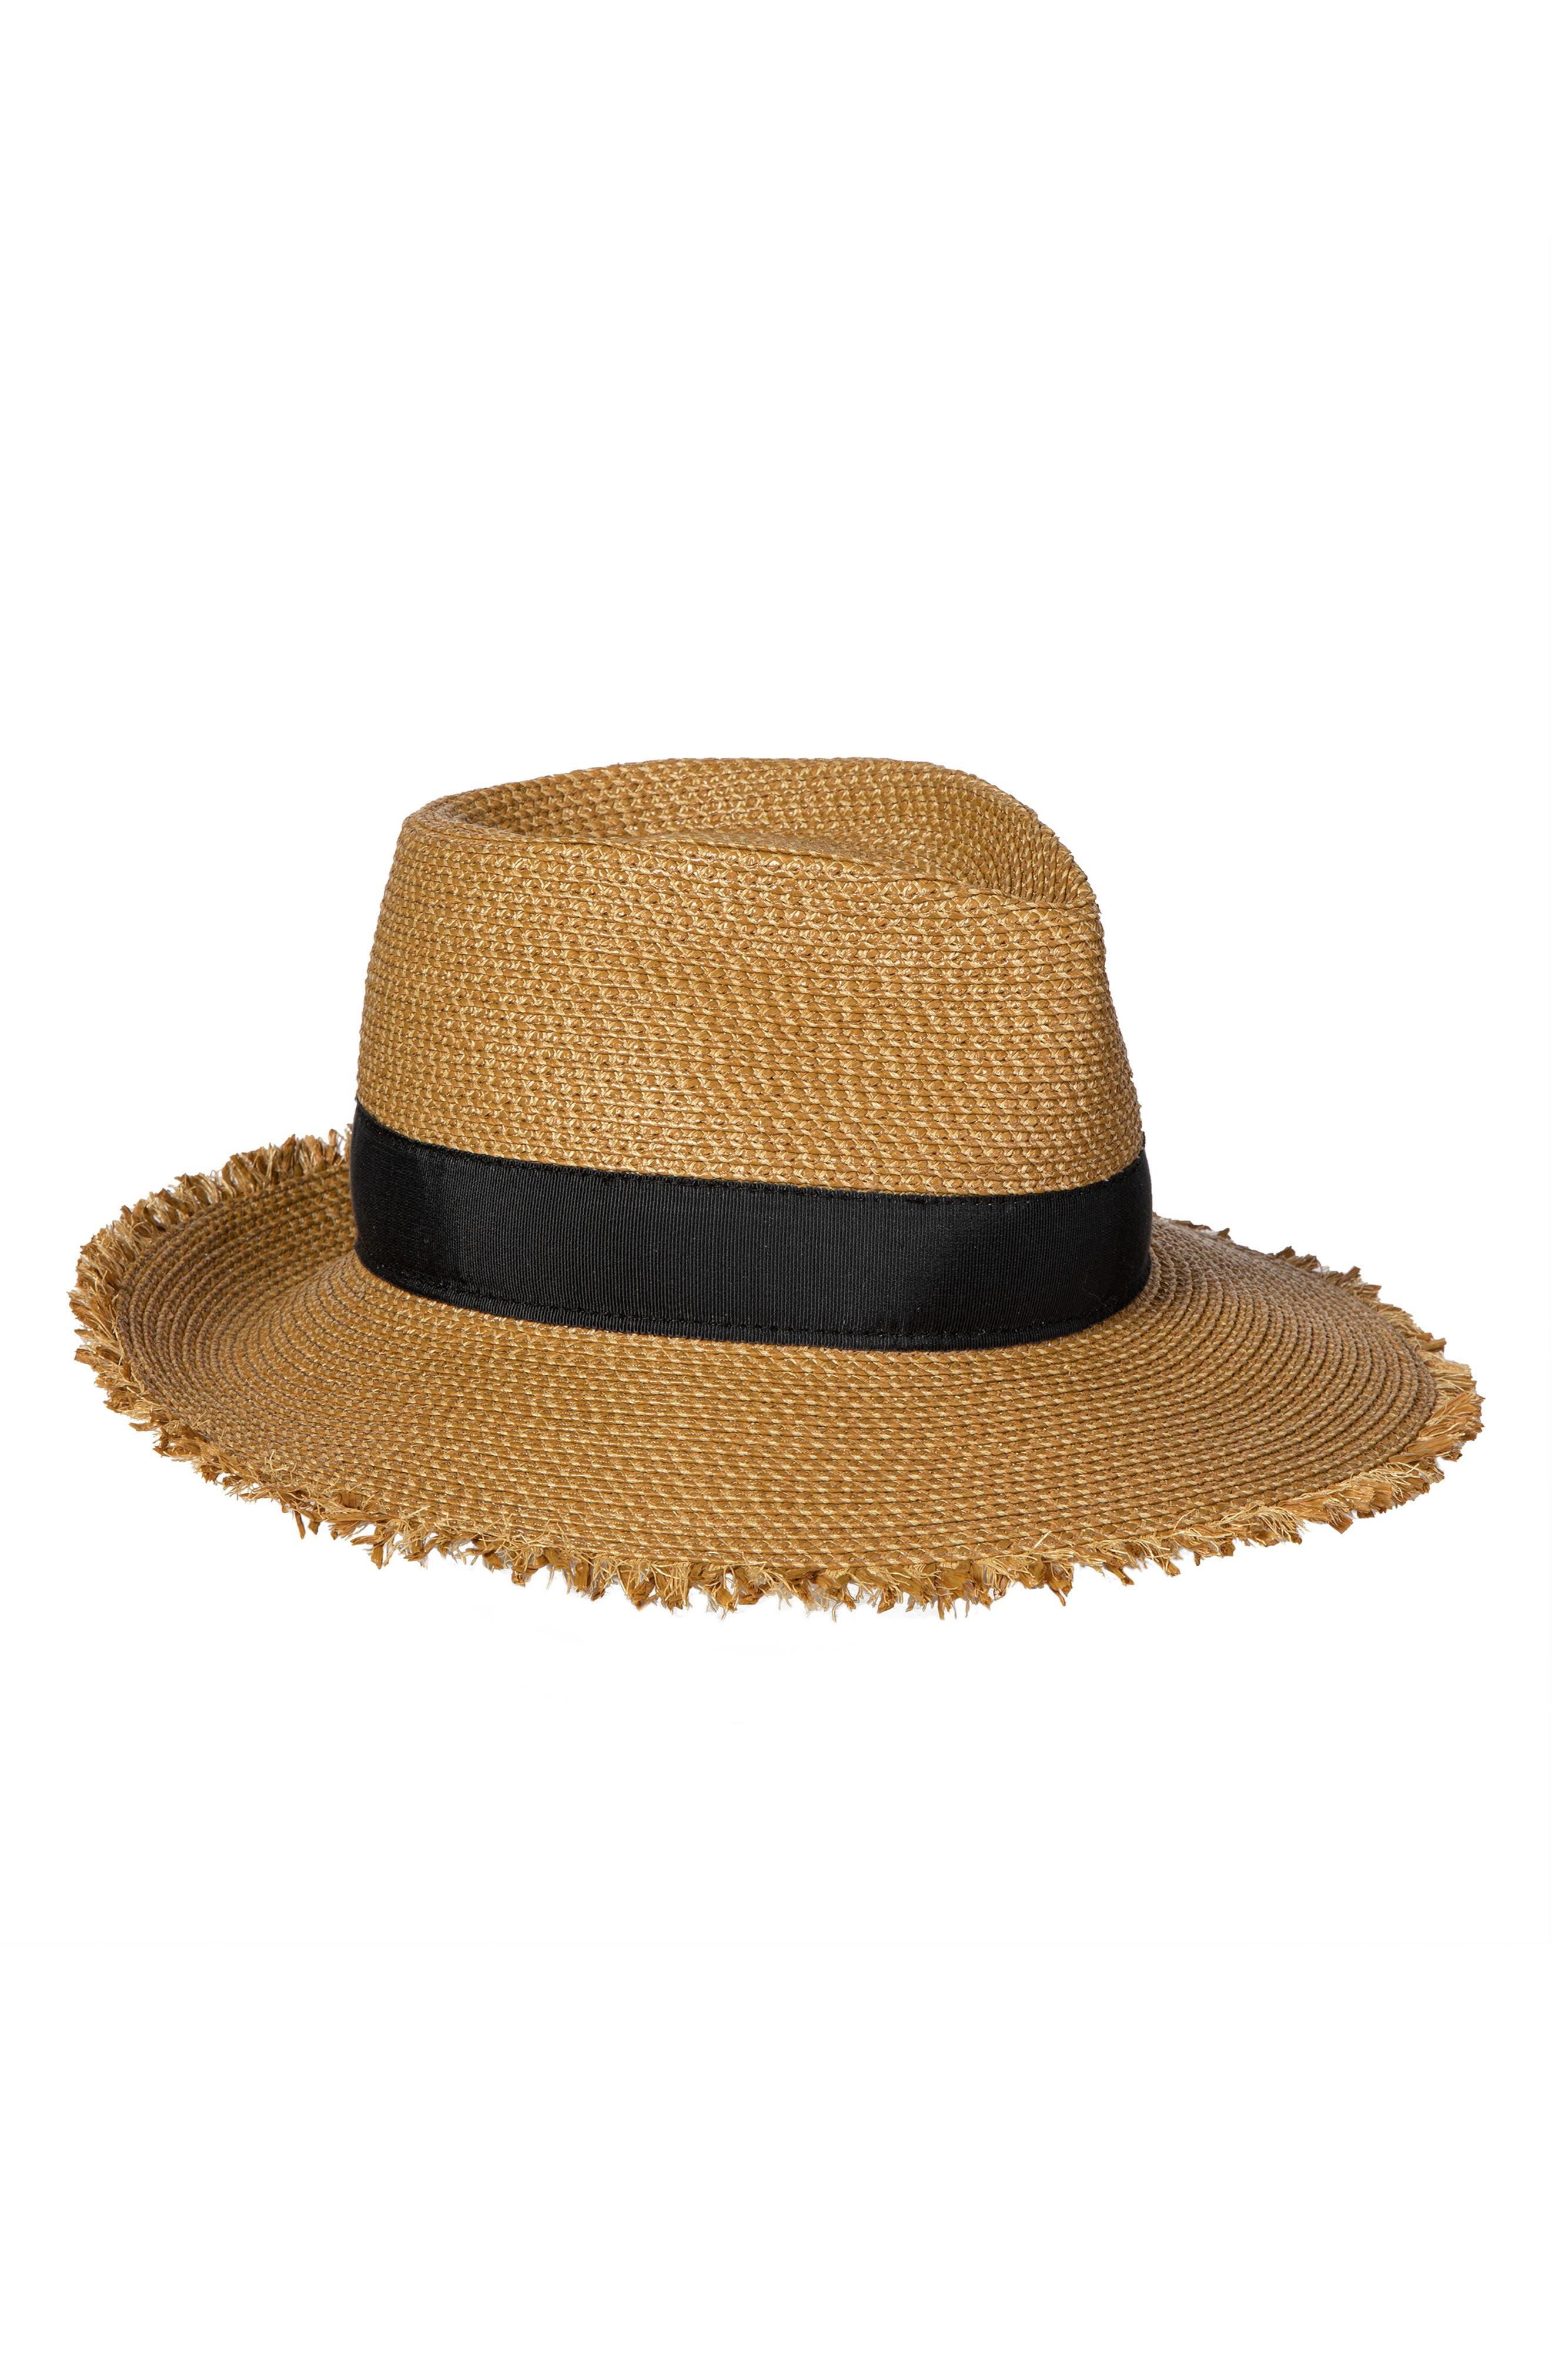 Fringe Pinch Squishee Packable Fedora Sun Hat